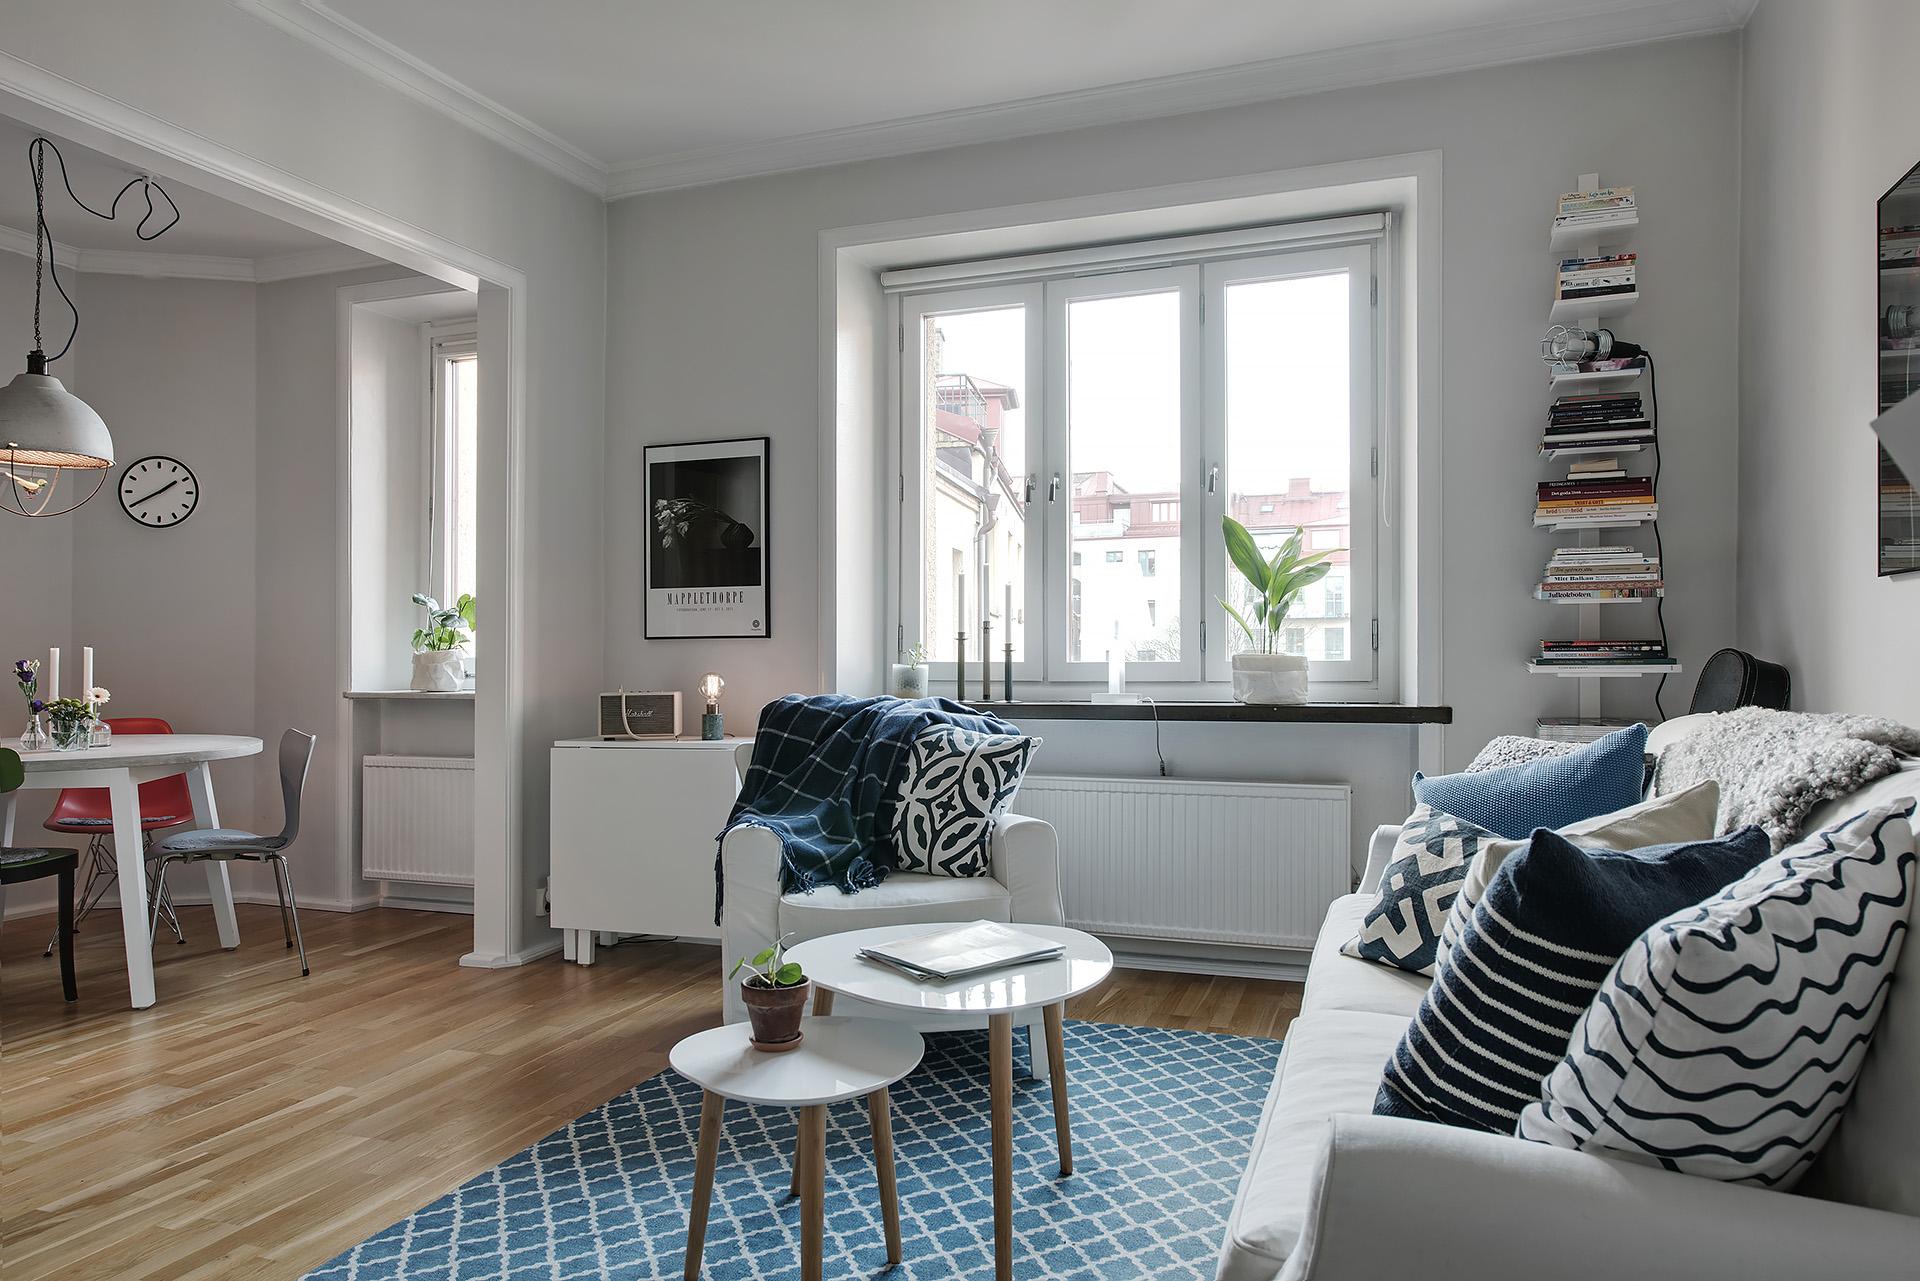 C mo decorar la primera vivienda estudio de alquiler for Decoracion piso 30 m